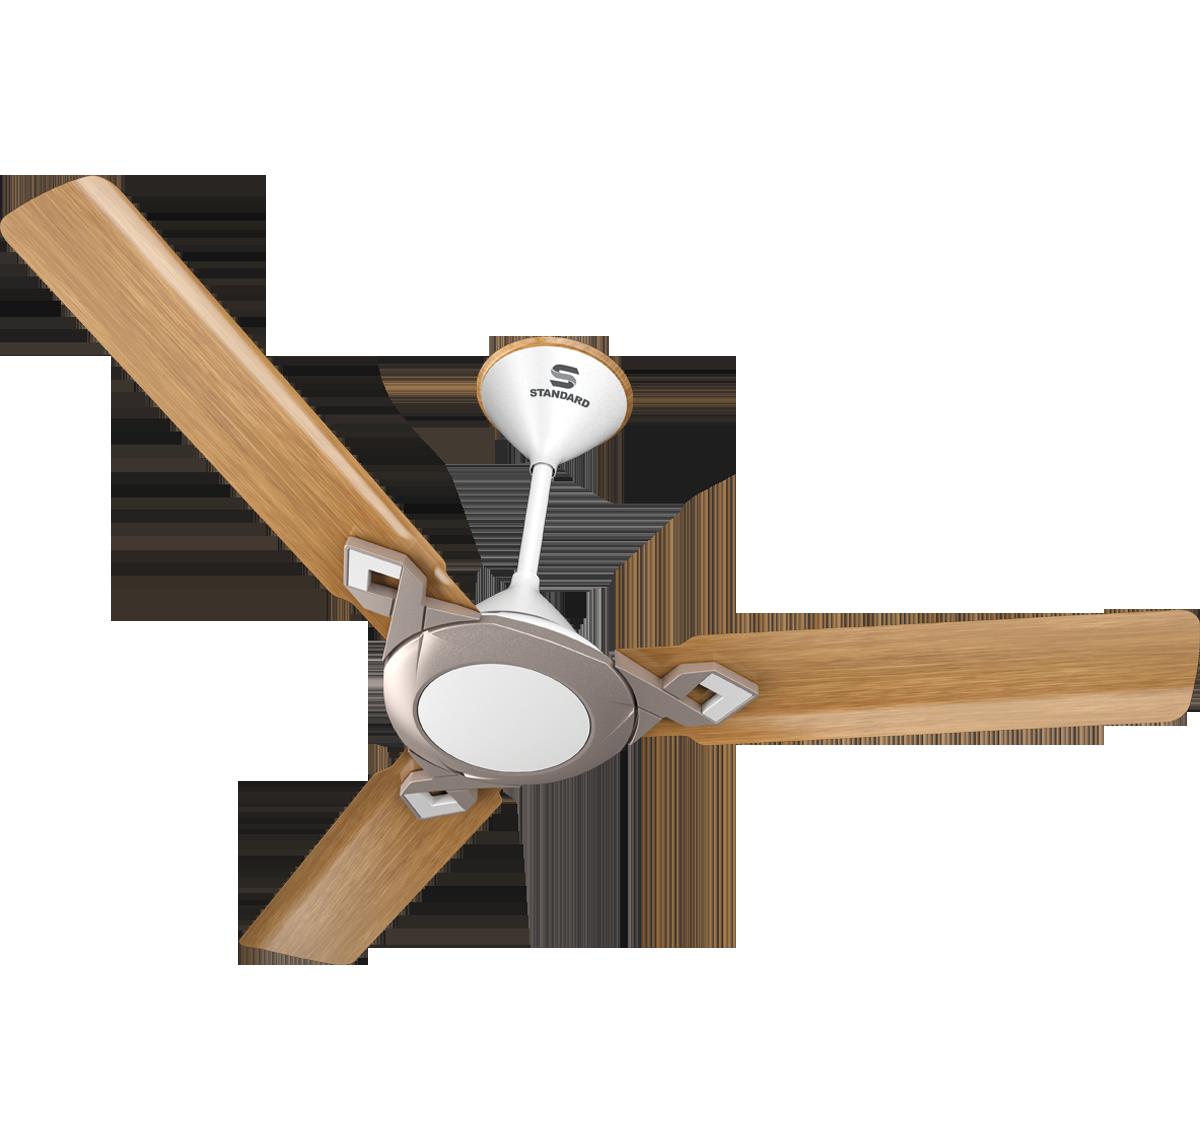 Standard Cruiser Refresh Ceiling Fan Sagar Electricals In 2020 Ceiling Fan Ceiling Fan Design Decorative Ceiling Fans